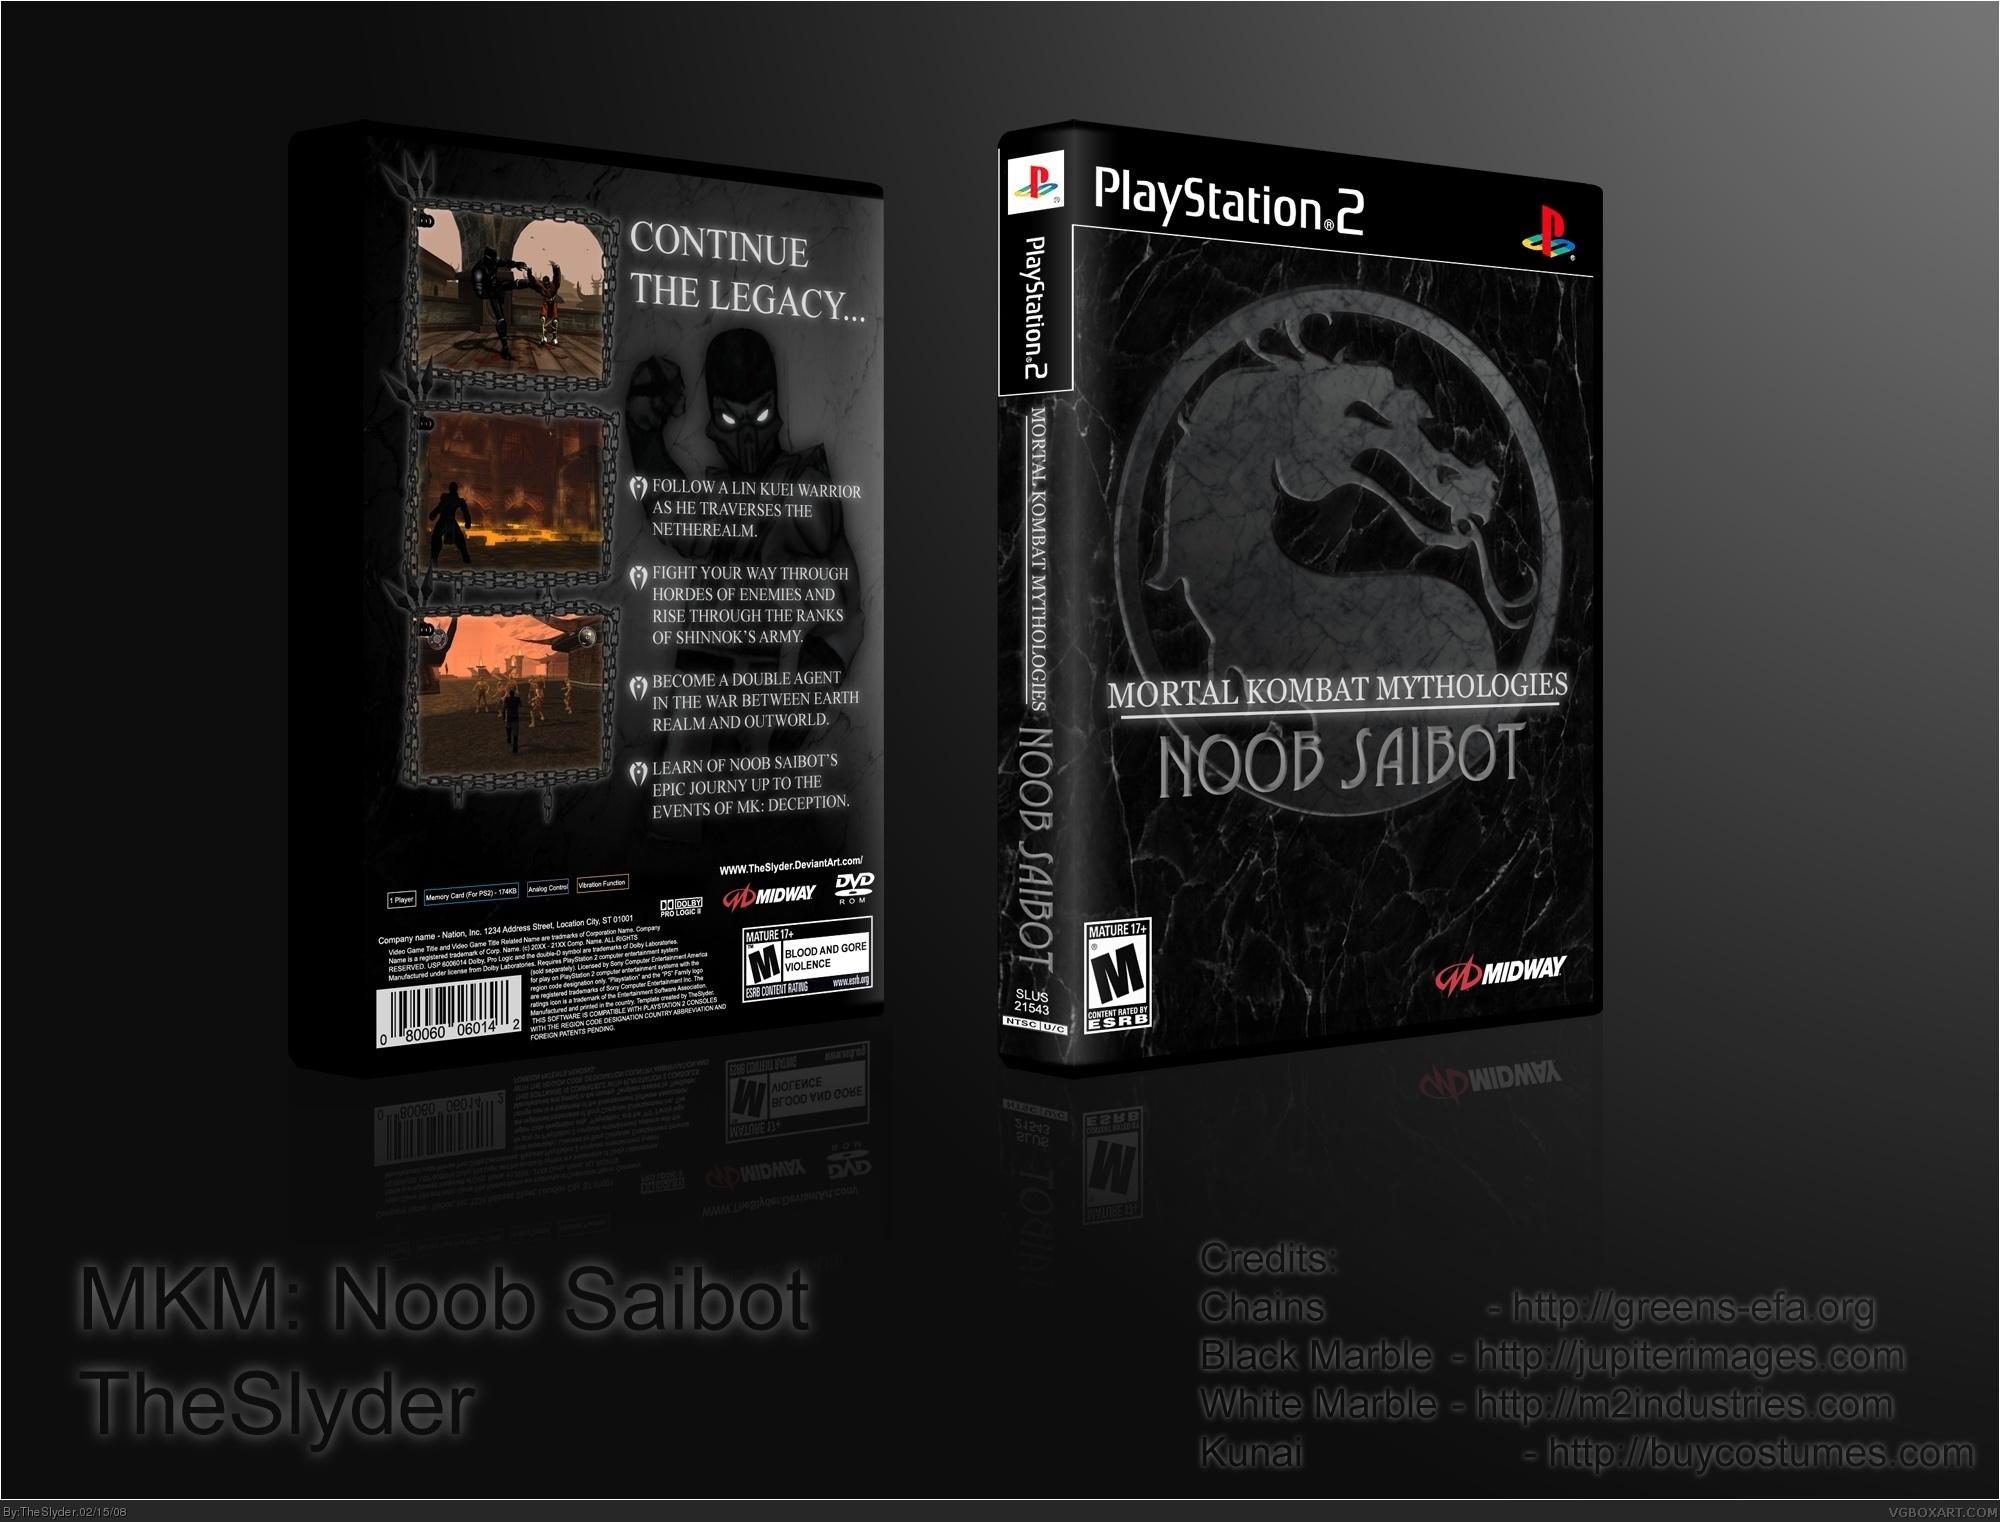 Mortal Kombat Mythologies Noob Saibot Playstation 2 Box